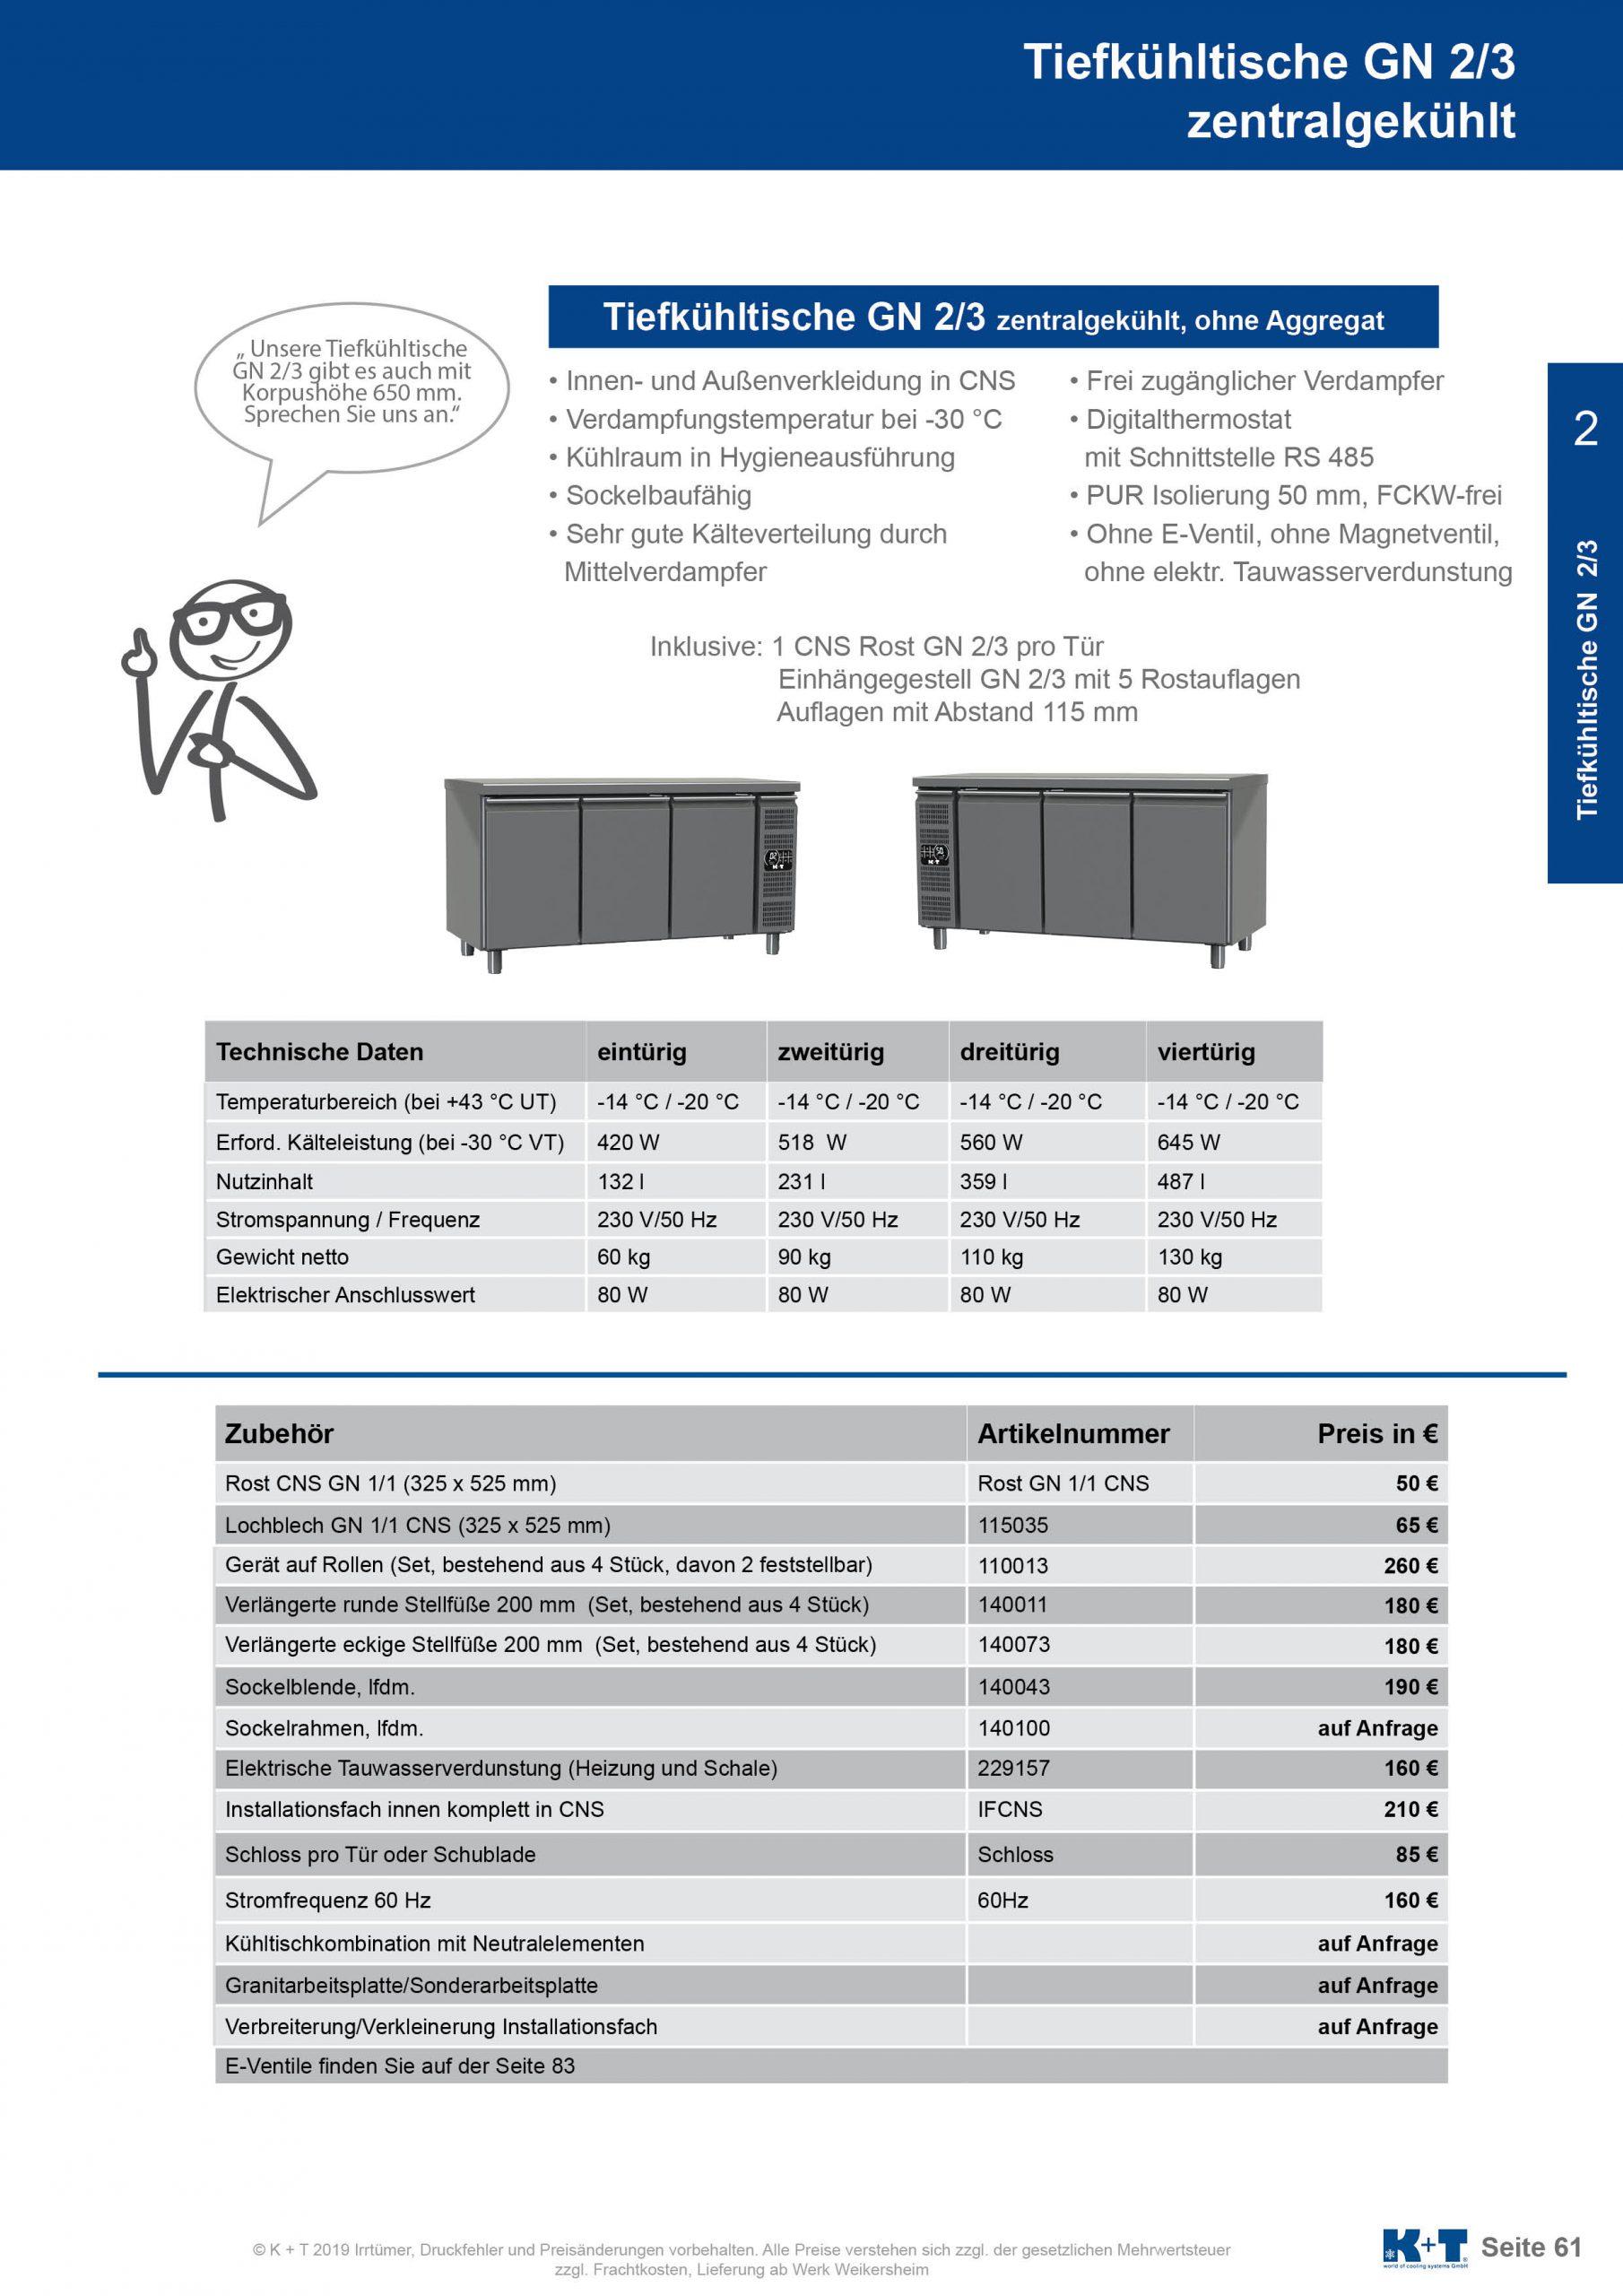 Tiefkühltisch GN 2_3 Korpus 700 zentralgekühlt 2